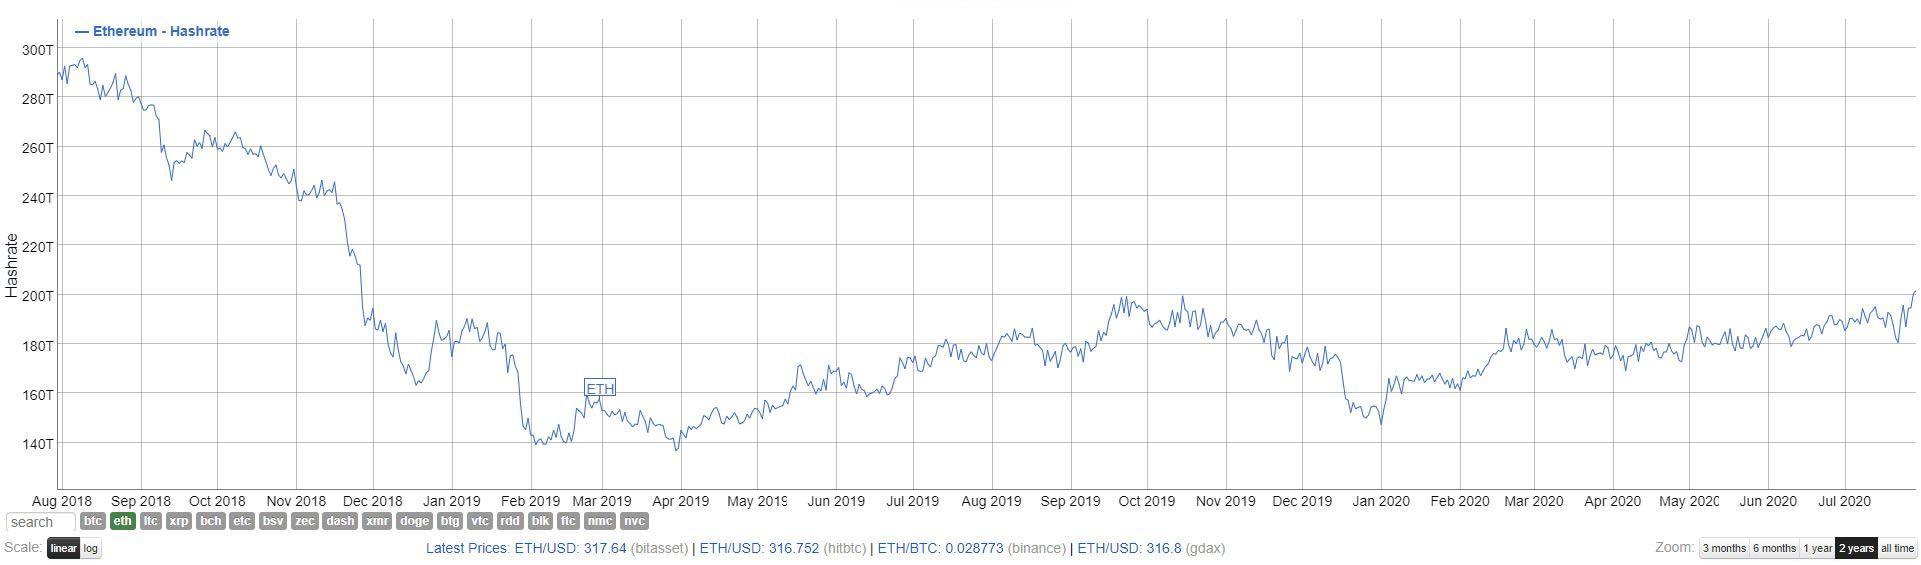 Ethereum hash rate